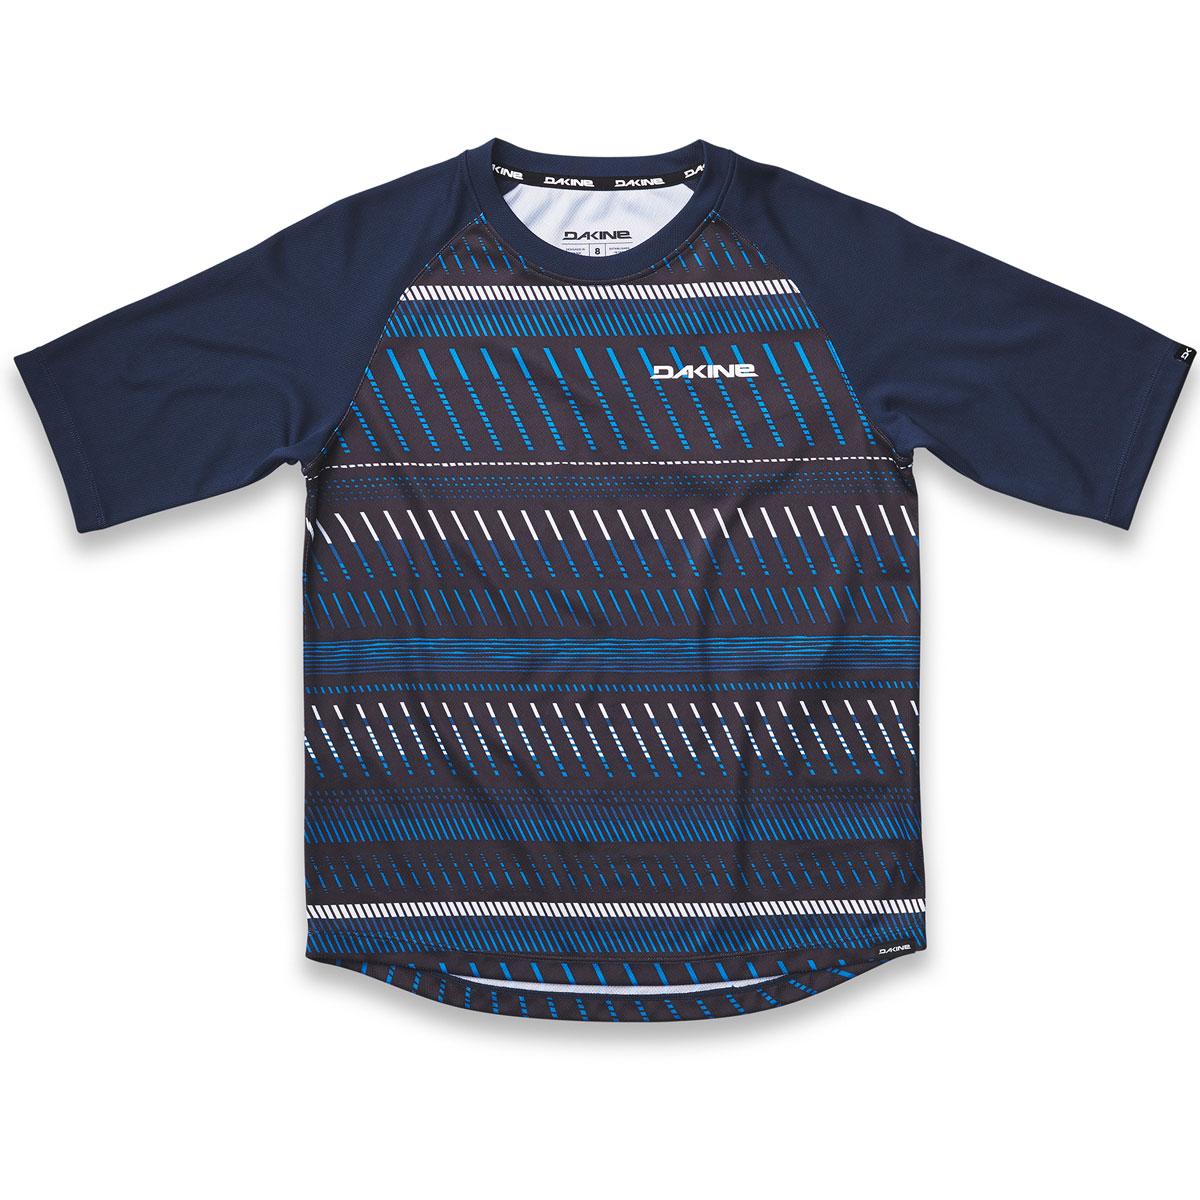 Dakine Dropout Kid s MTB Short Sleeve Jersey Ventana 10 610934200386 ... 7c5db775a